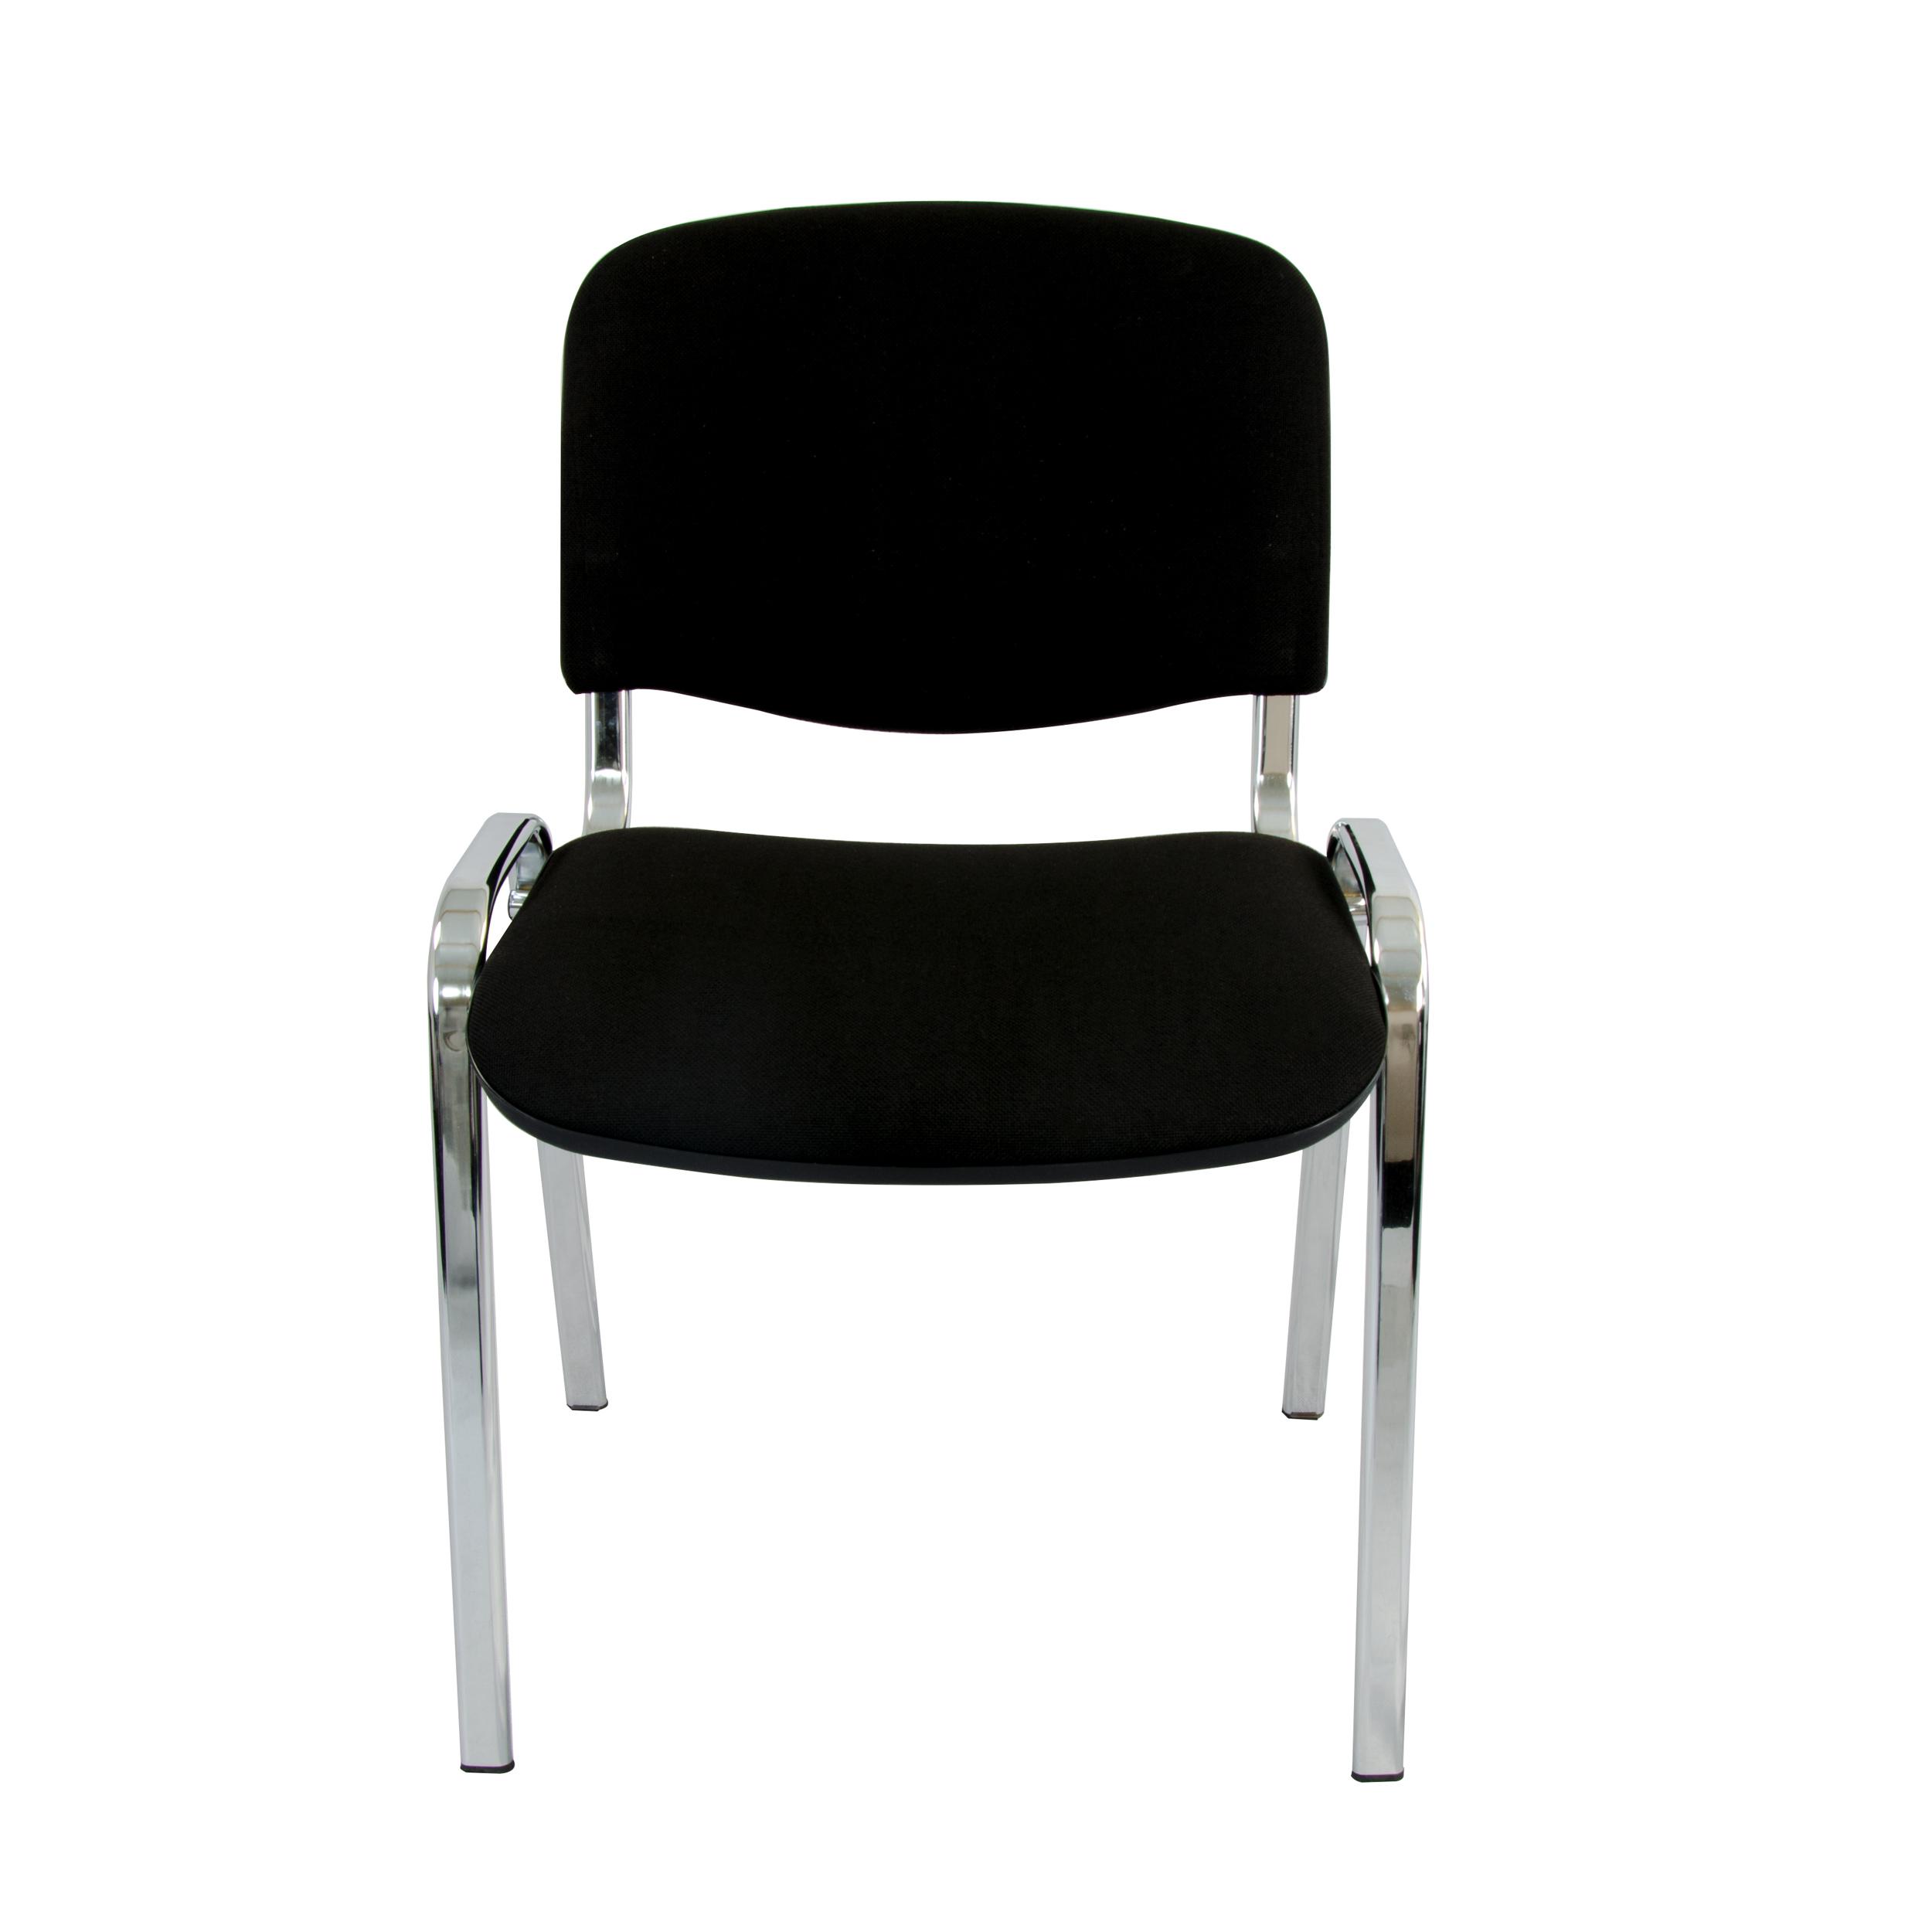 LEO Besucherstuhl schwarz Stapelbar Konferenzstuhl Seminarstuhl Stapelstuhl